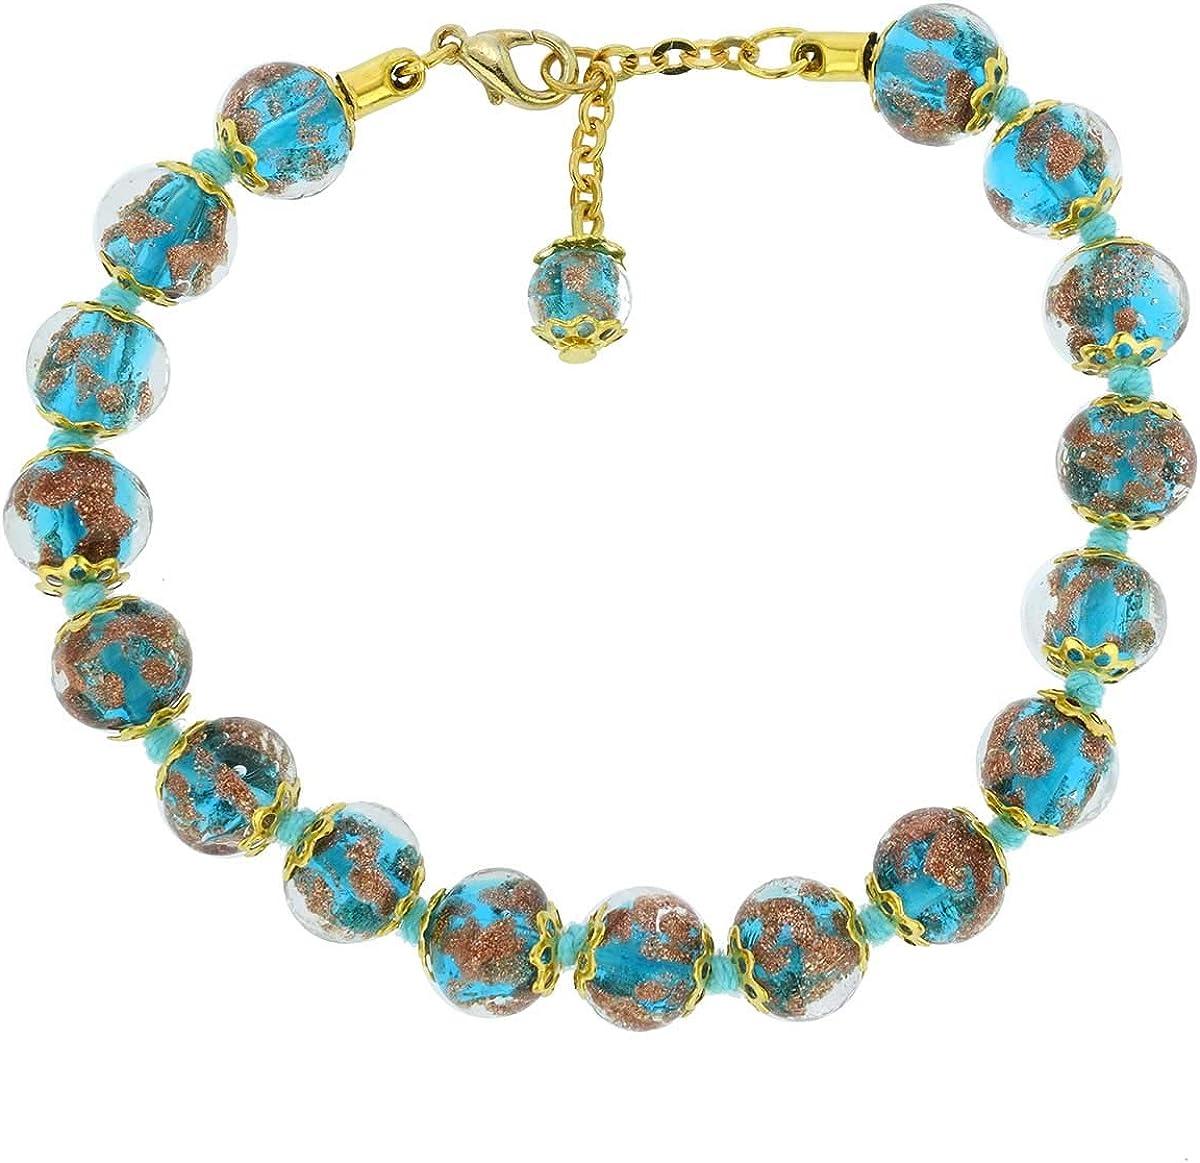 Original Murano Glass Necklace Millefiori Style Handmade In Italy Jewelry Black Glass Beads Hand Blown Glass